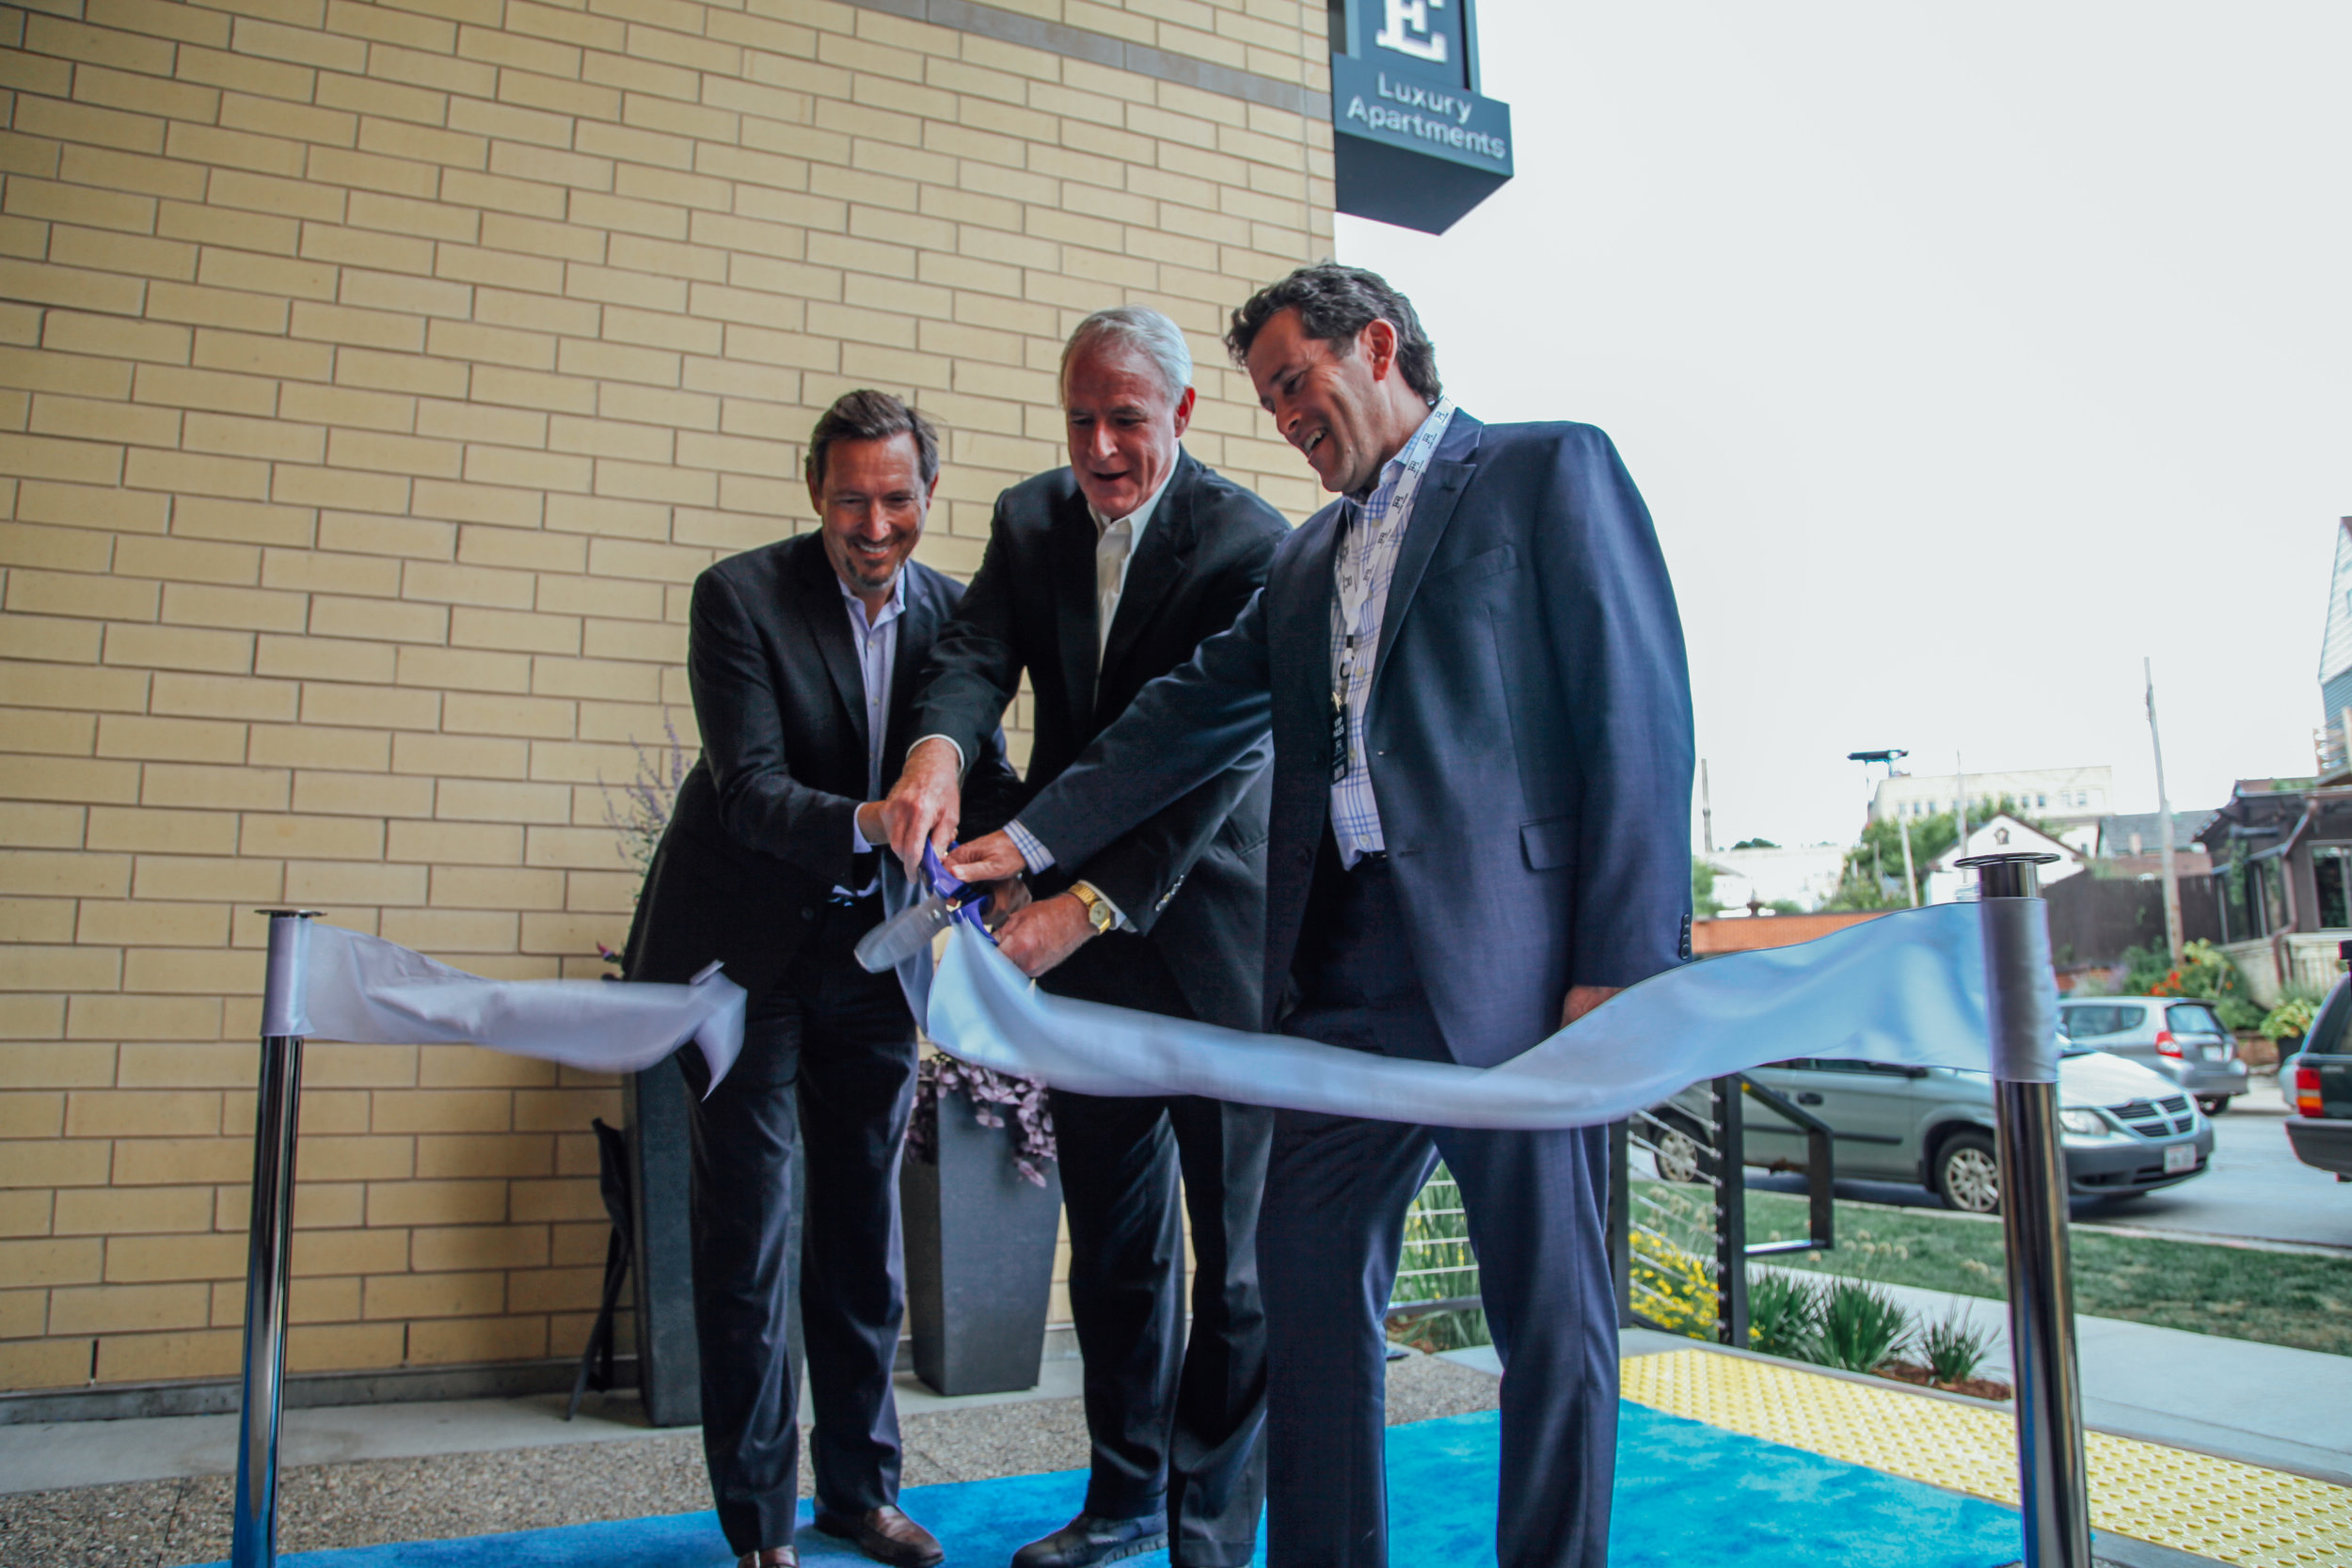 2017-08-17 - River House Grand Opening 003.jpg